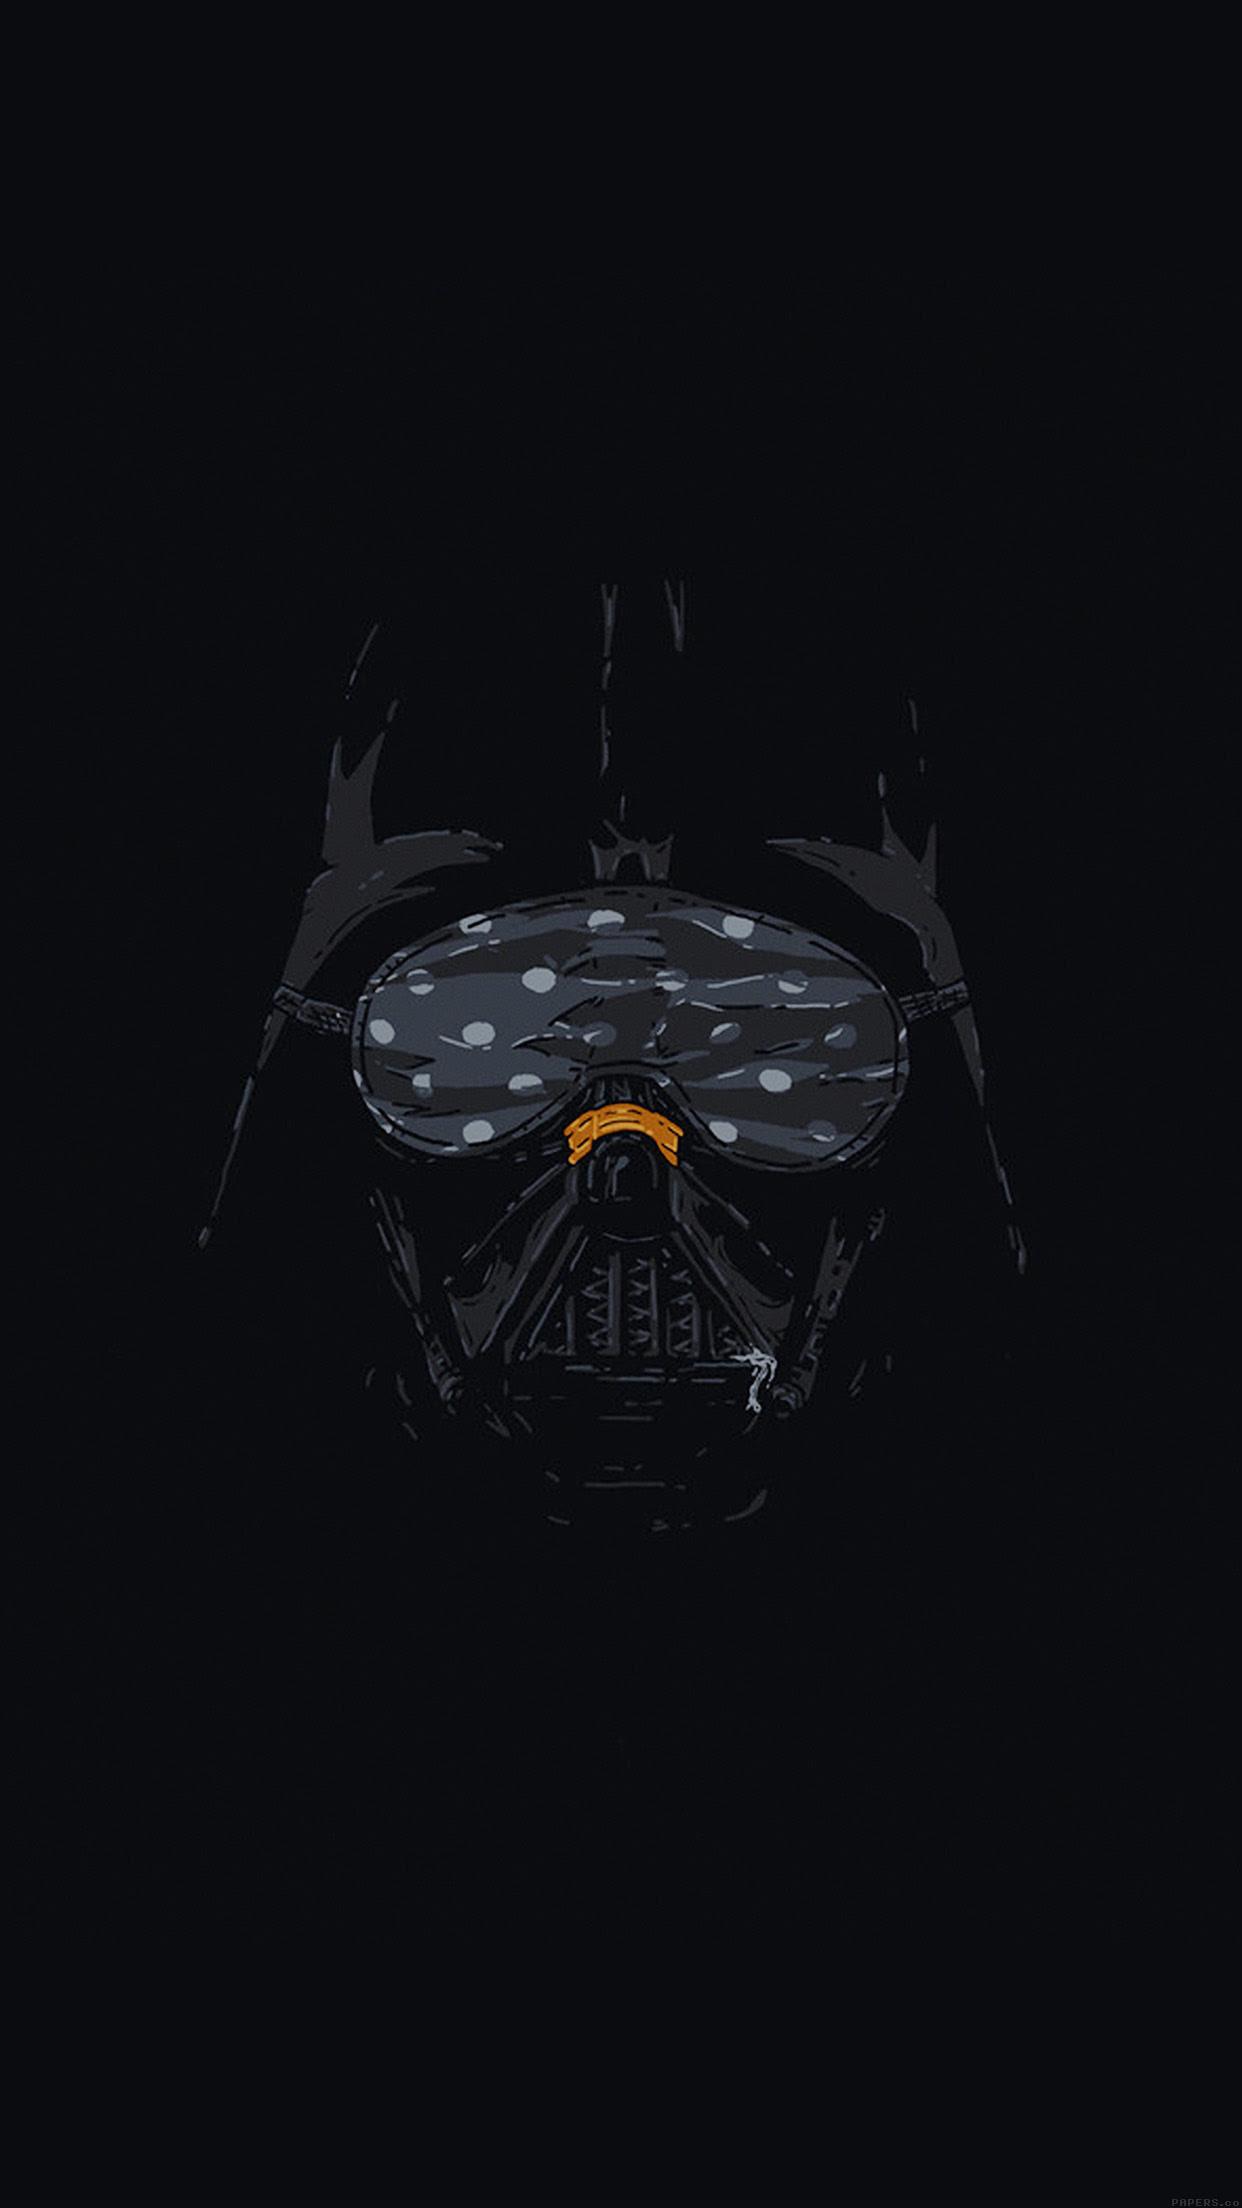 Iphone6papers Ah87 Darth Vader Minimal Starwars Illust Art